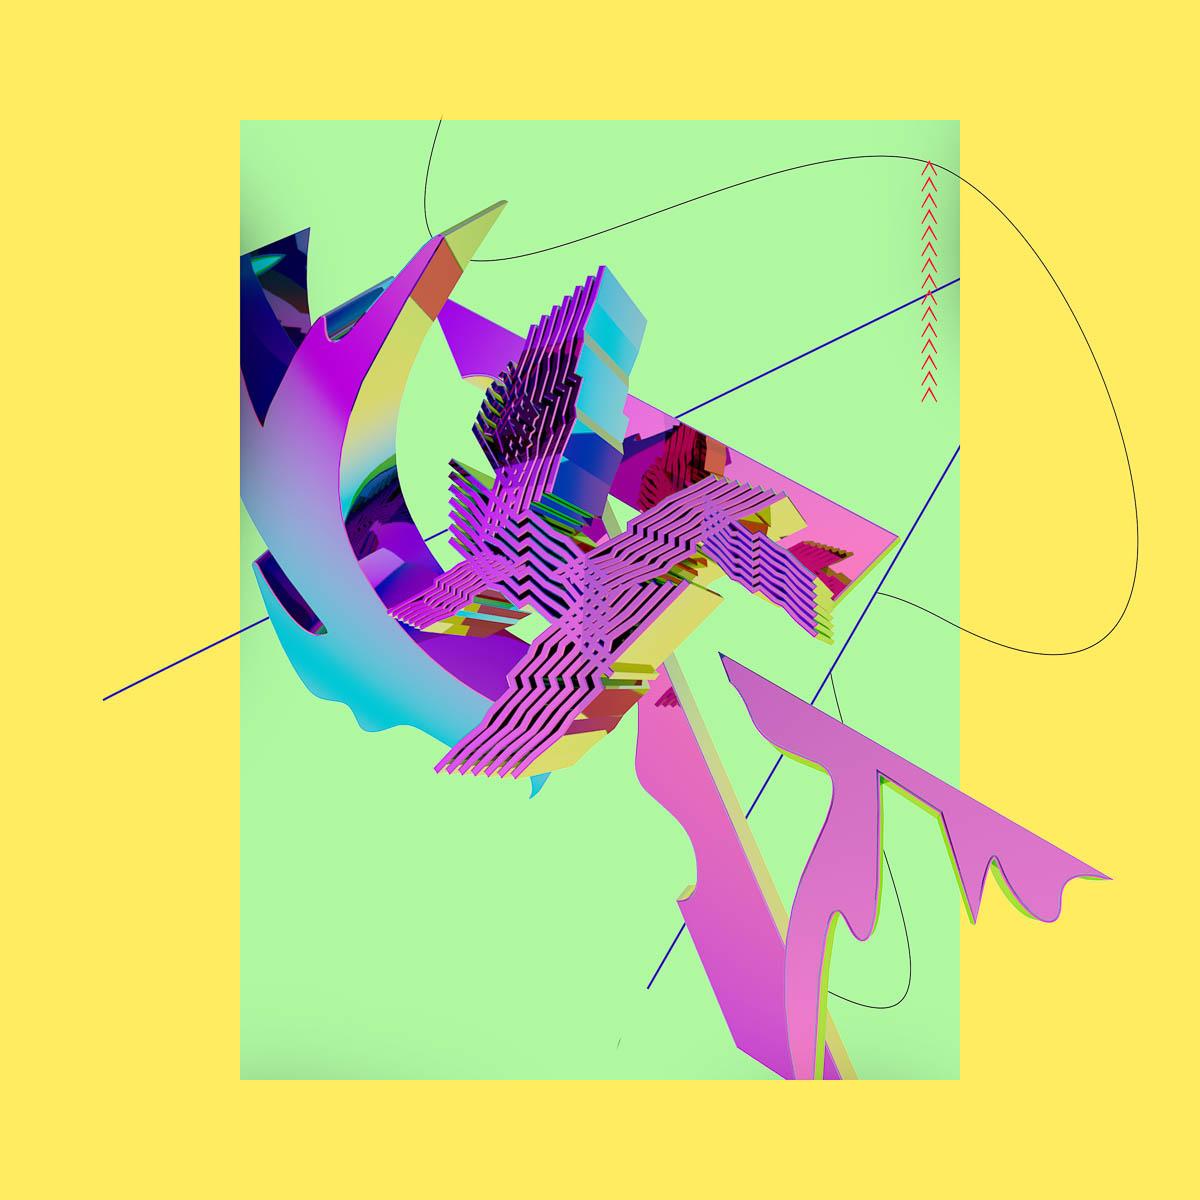 Design 28 – Change The Game